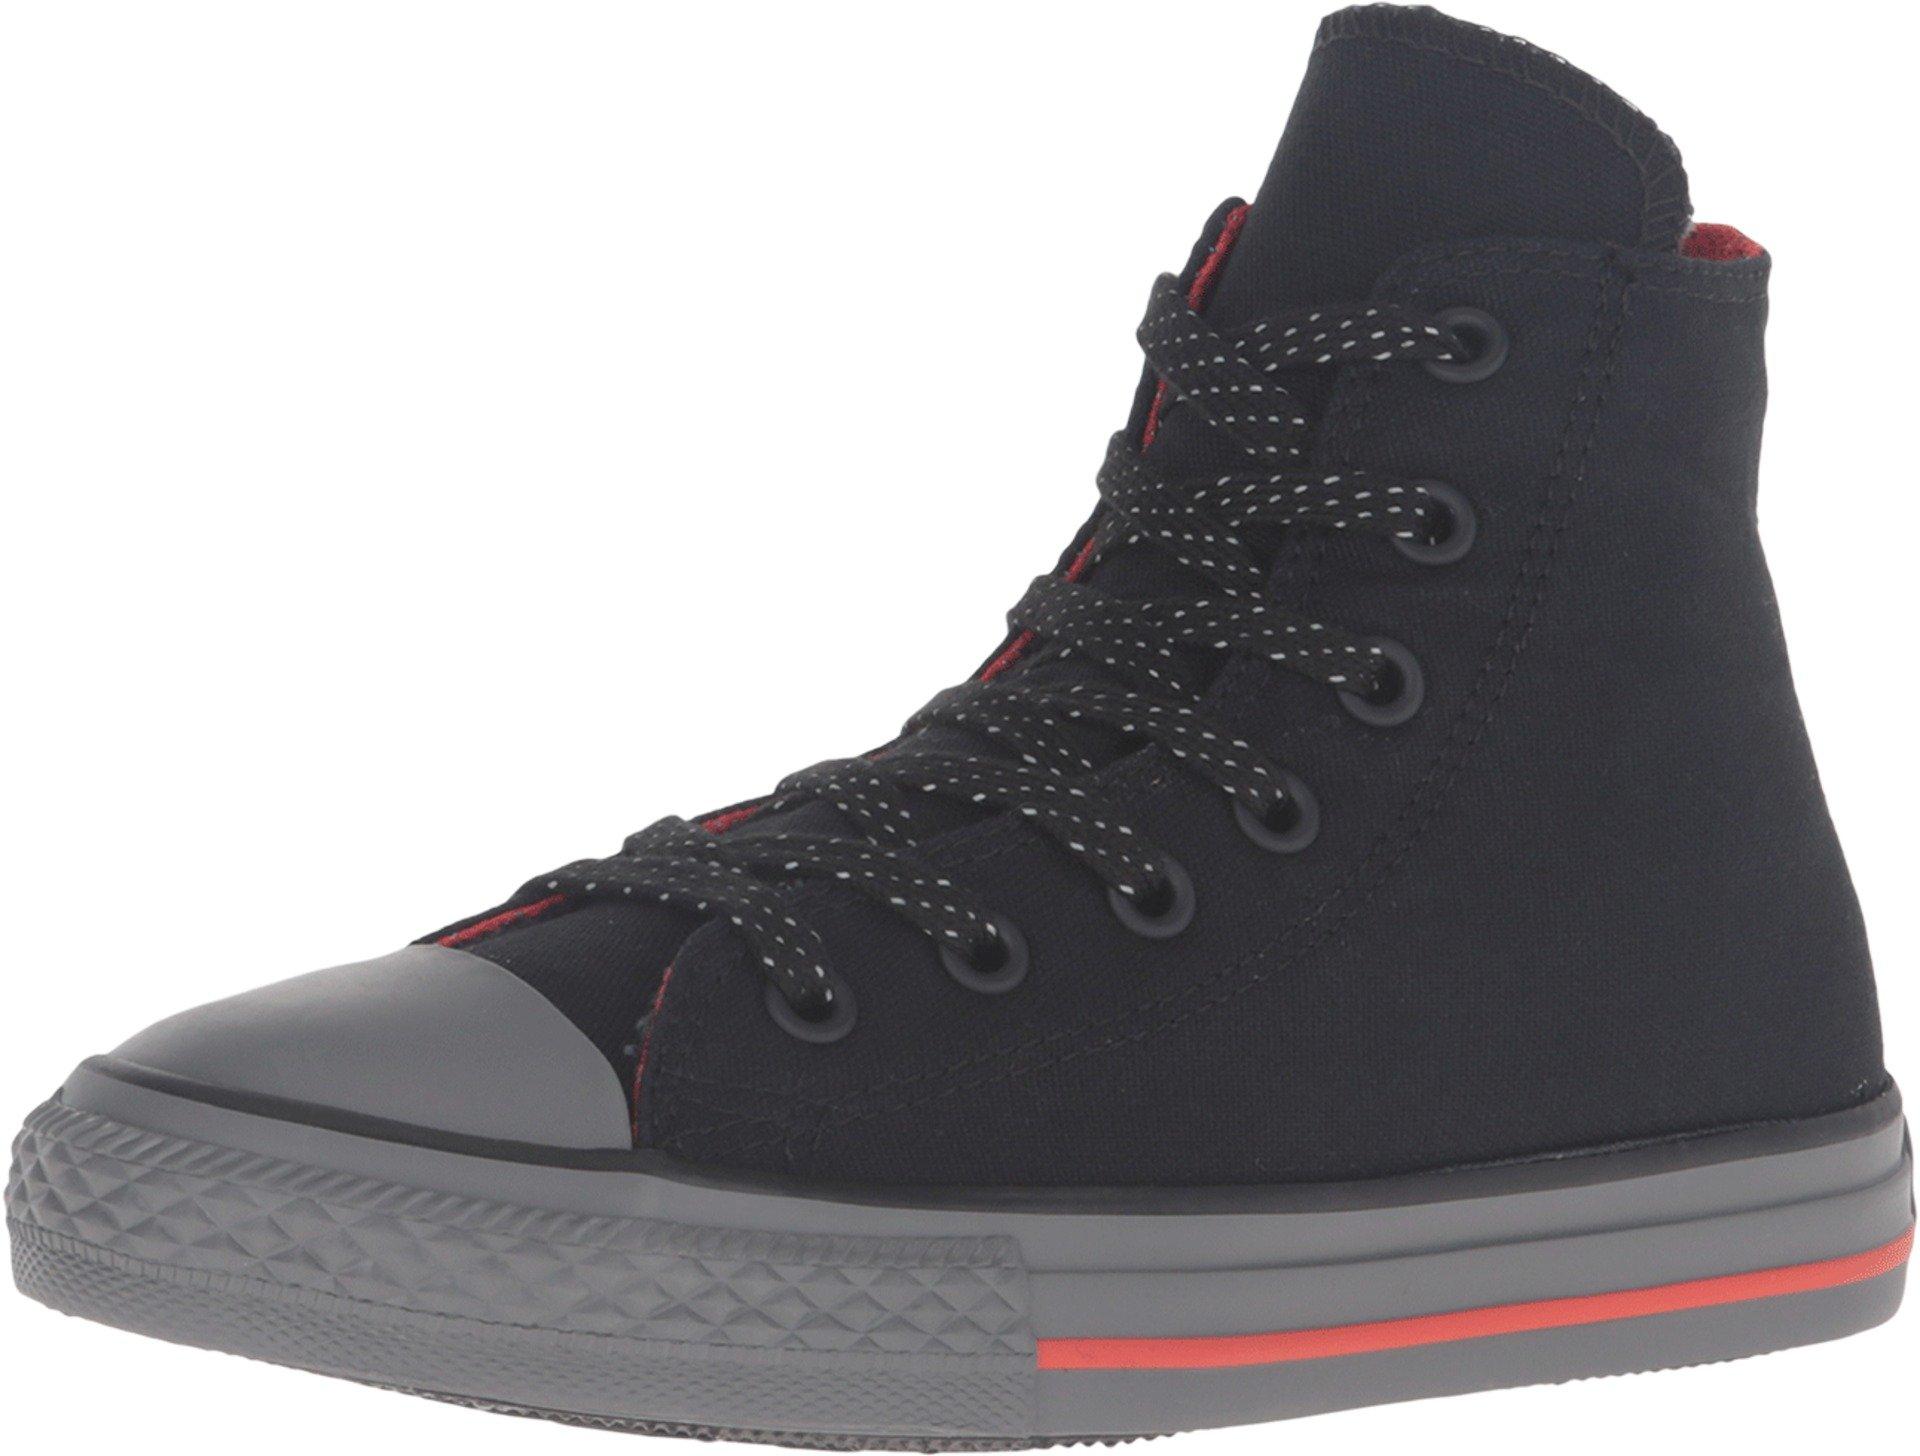 Converse Kid's Chuck Taylor All Star Hi Top Fashion Sneaker Shoe - Black/Signal Red/Thinder - Boys/Girls - 11